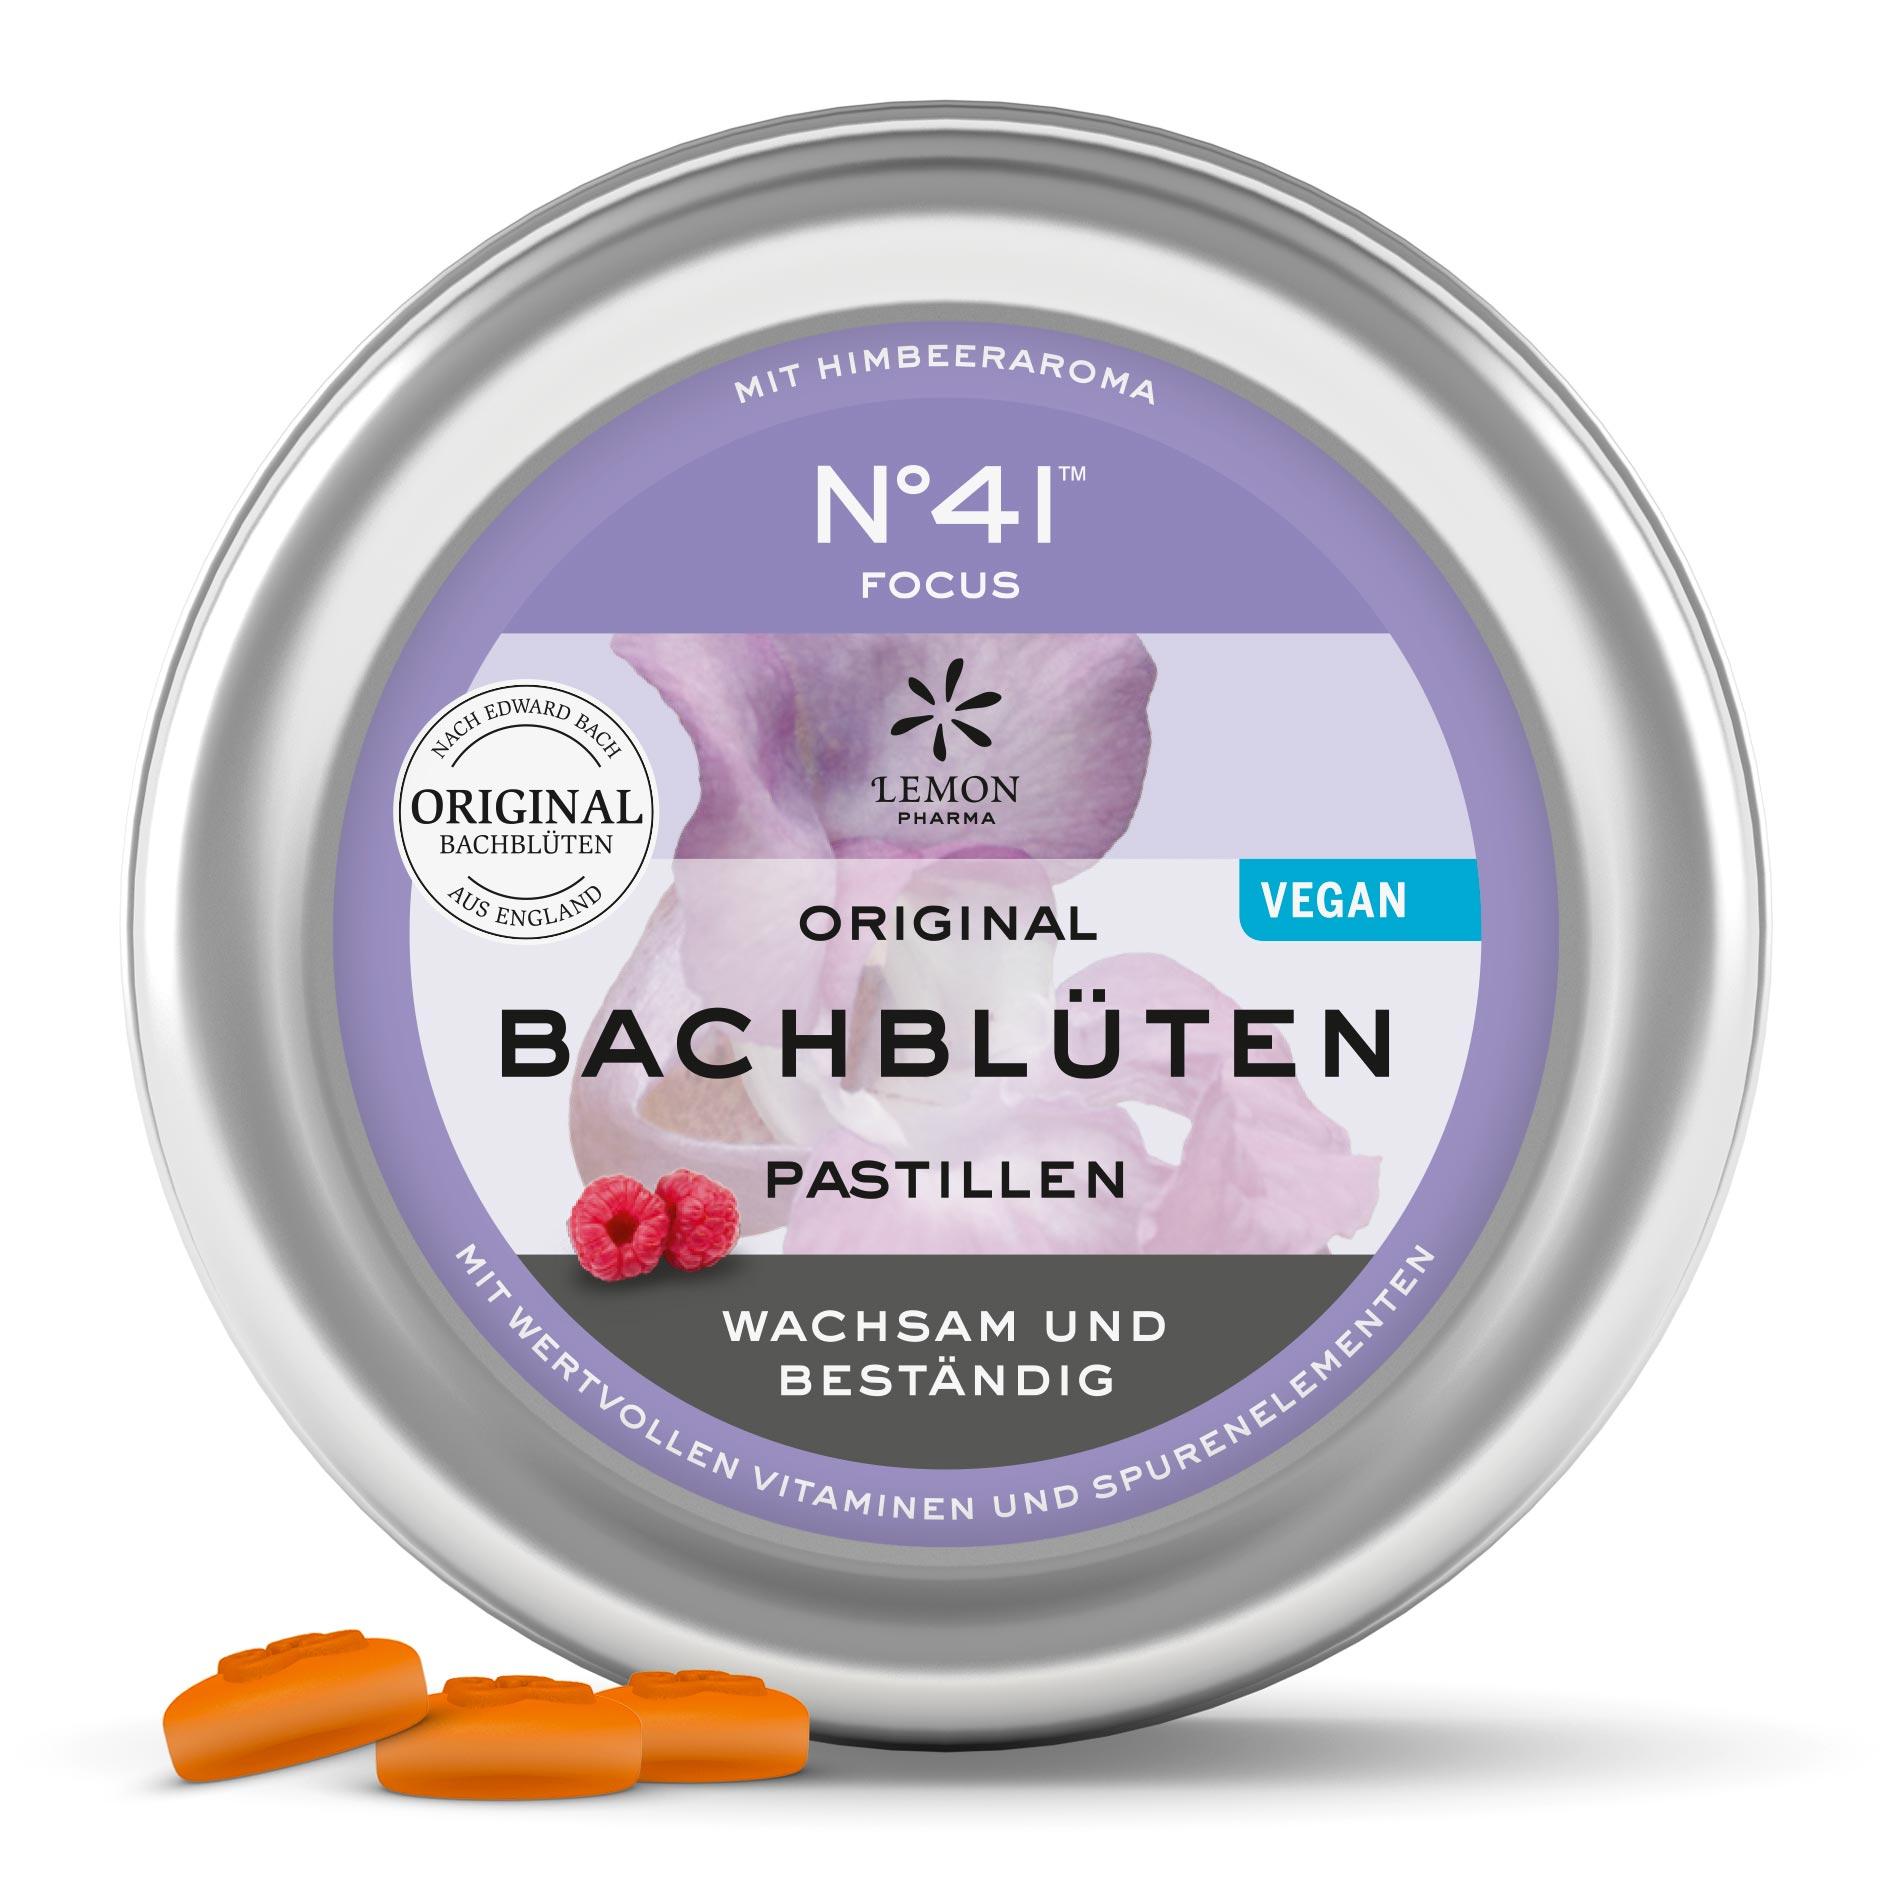 Lemon Pharma Original Bachblüten Nr 41 Focus Pastillen Wachsam und Beständig vegan